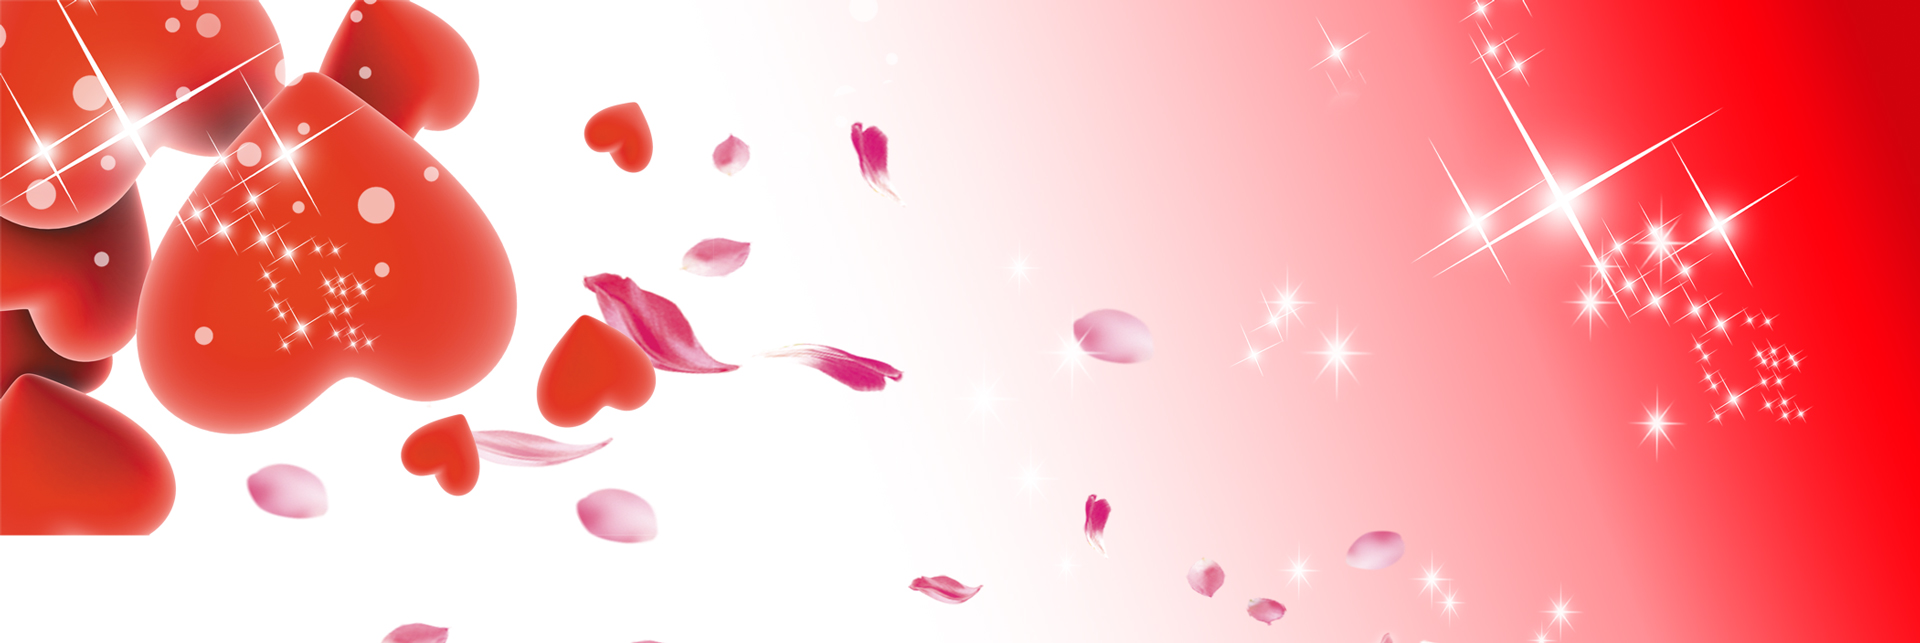 rose conception art sch u00e9ma contexte des confettis